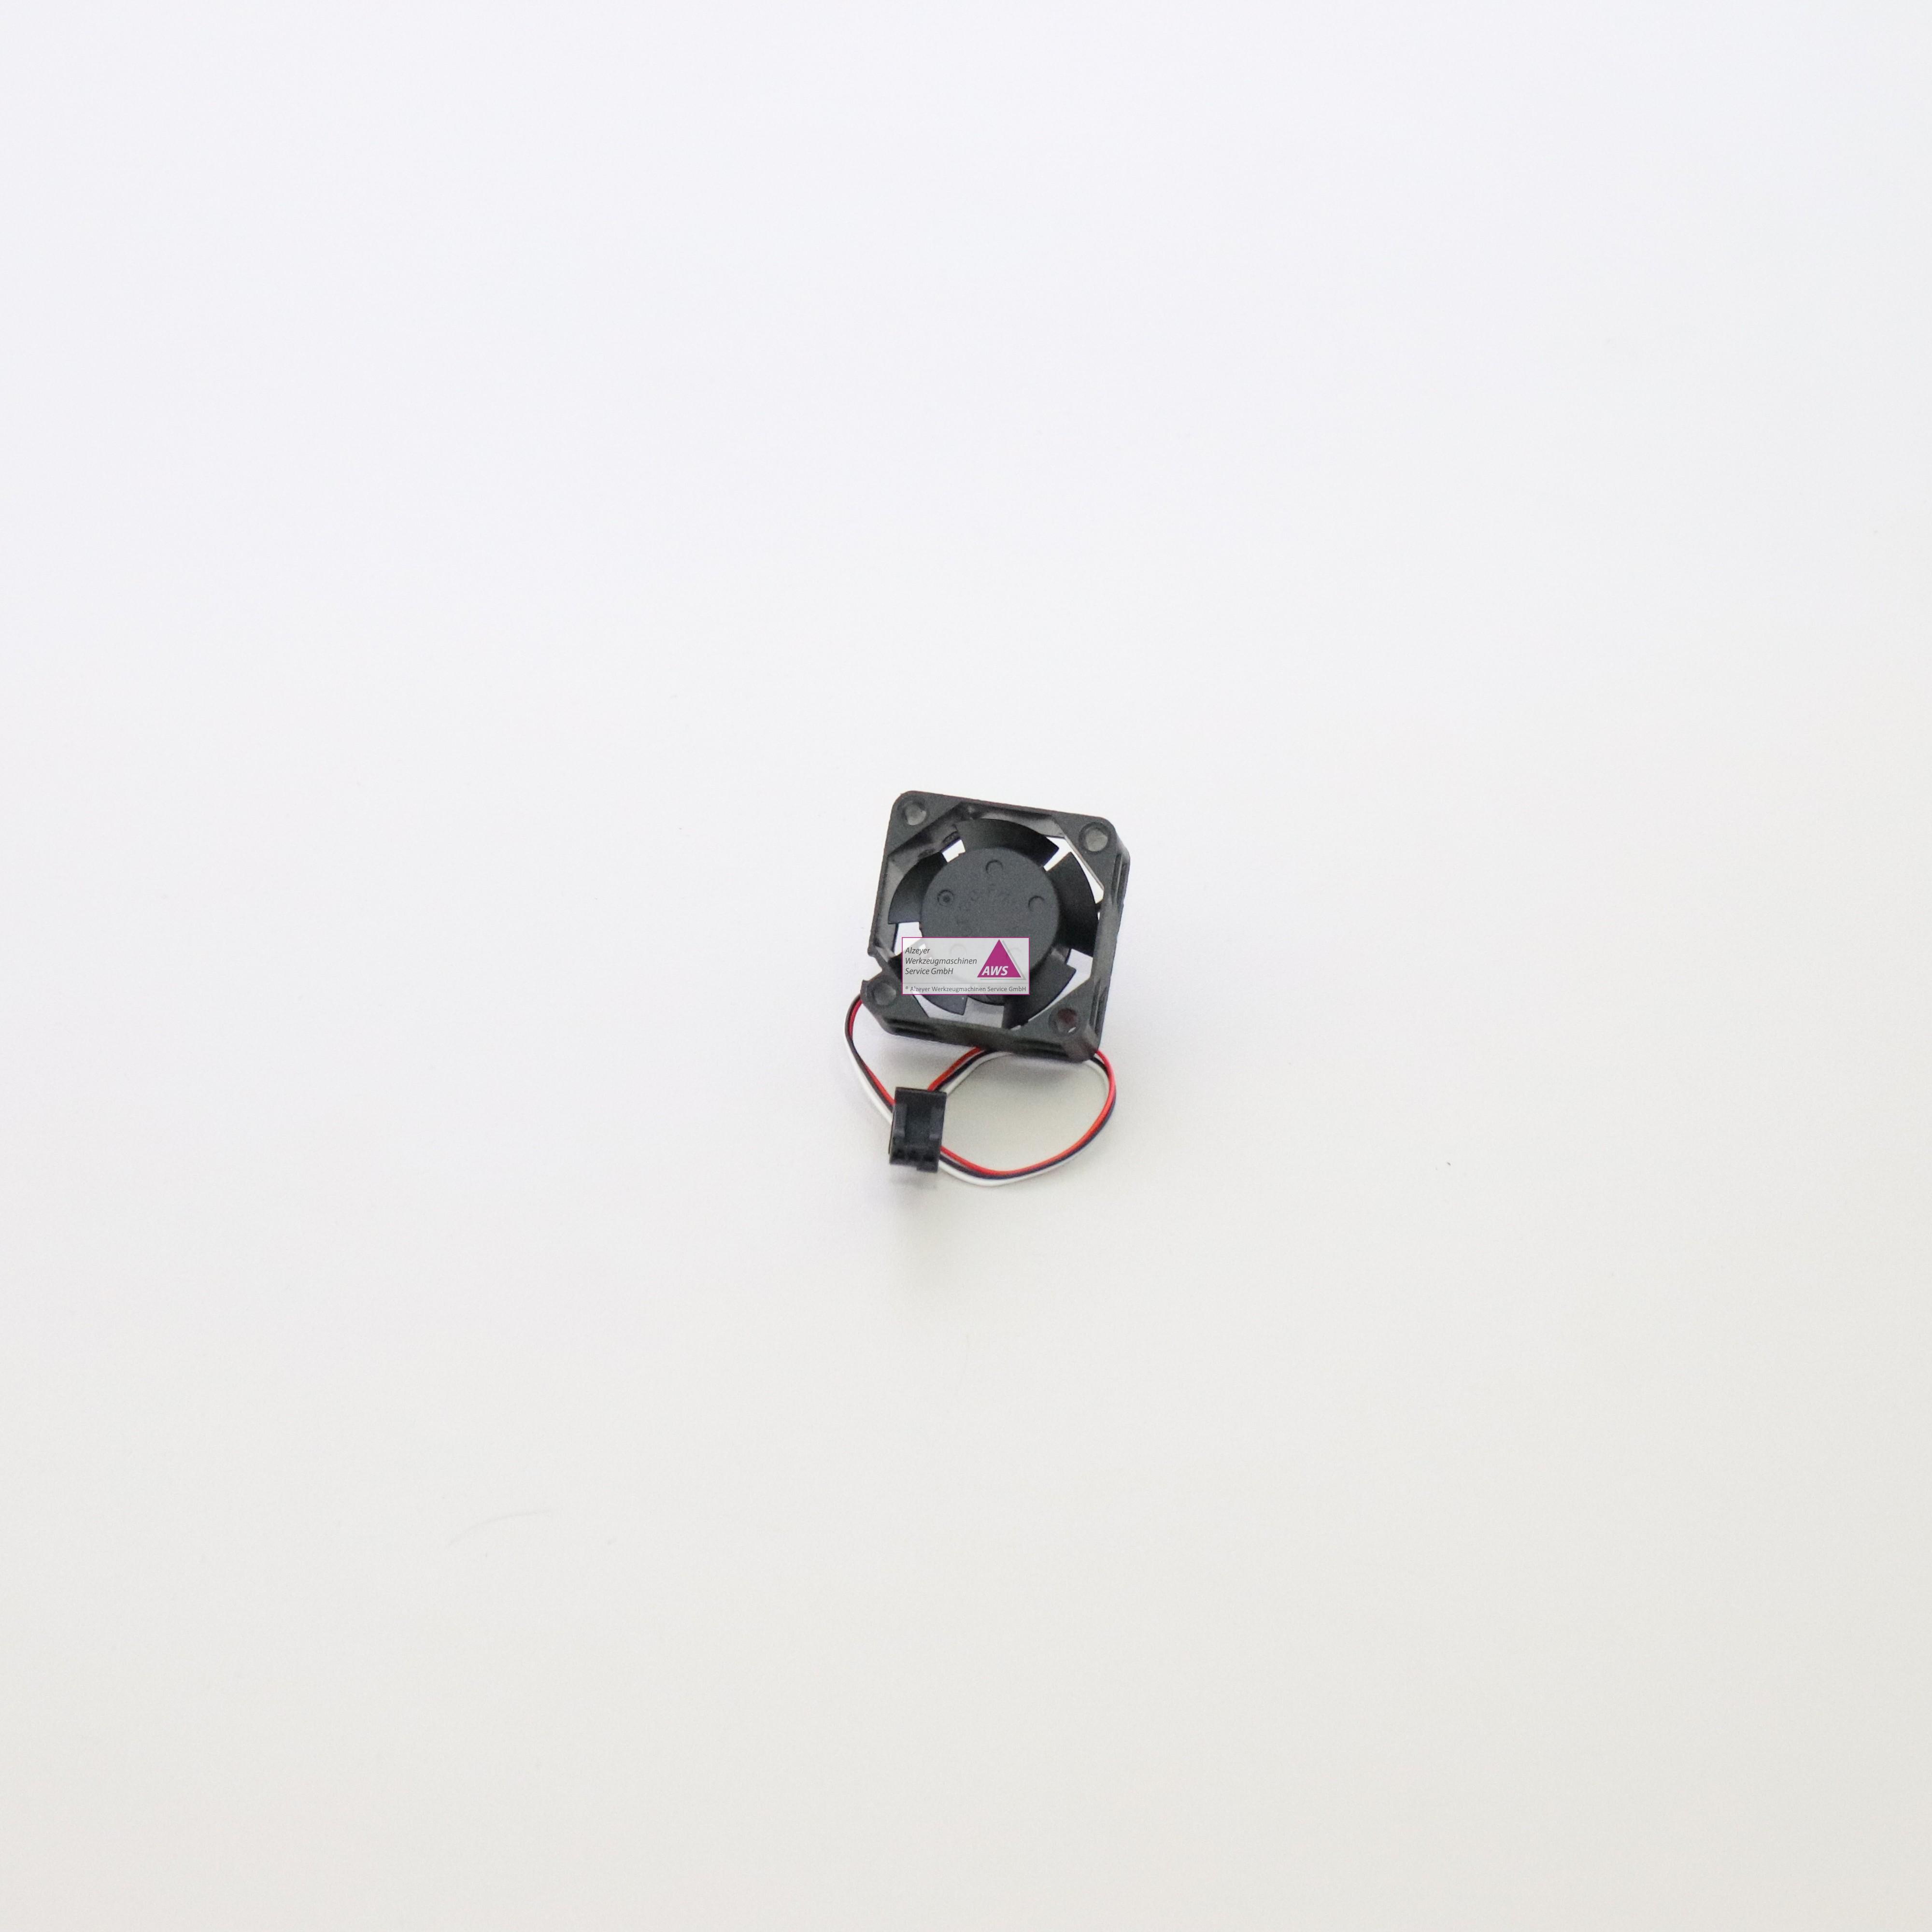 Ventilator Viereckig 41x41x20mm dick (24VDC)